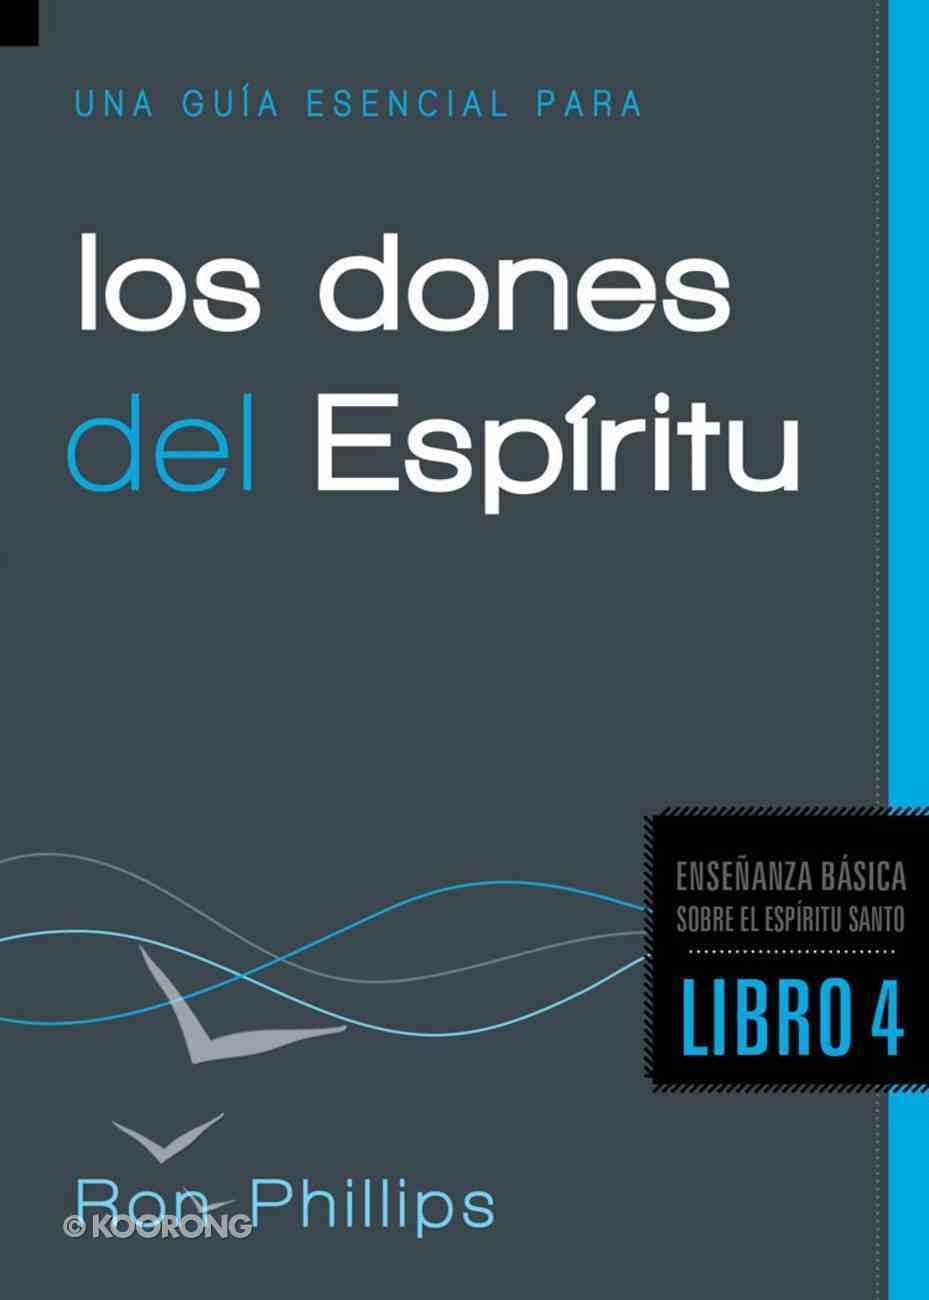 Una Guia Esencial Para Los Dones Espirituales (Spanish) (Spa) (An Essential Guide To Spiritual Gifts) eBook